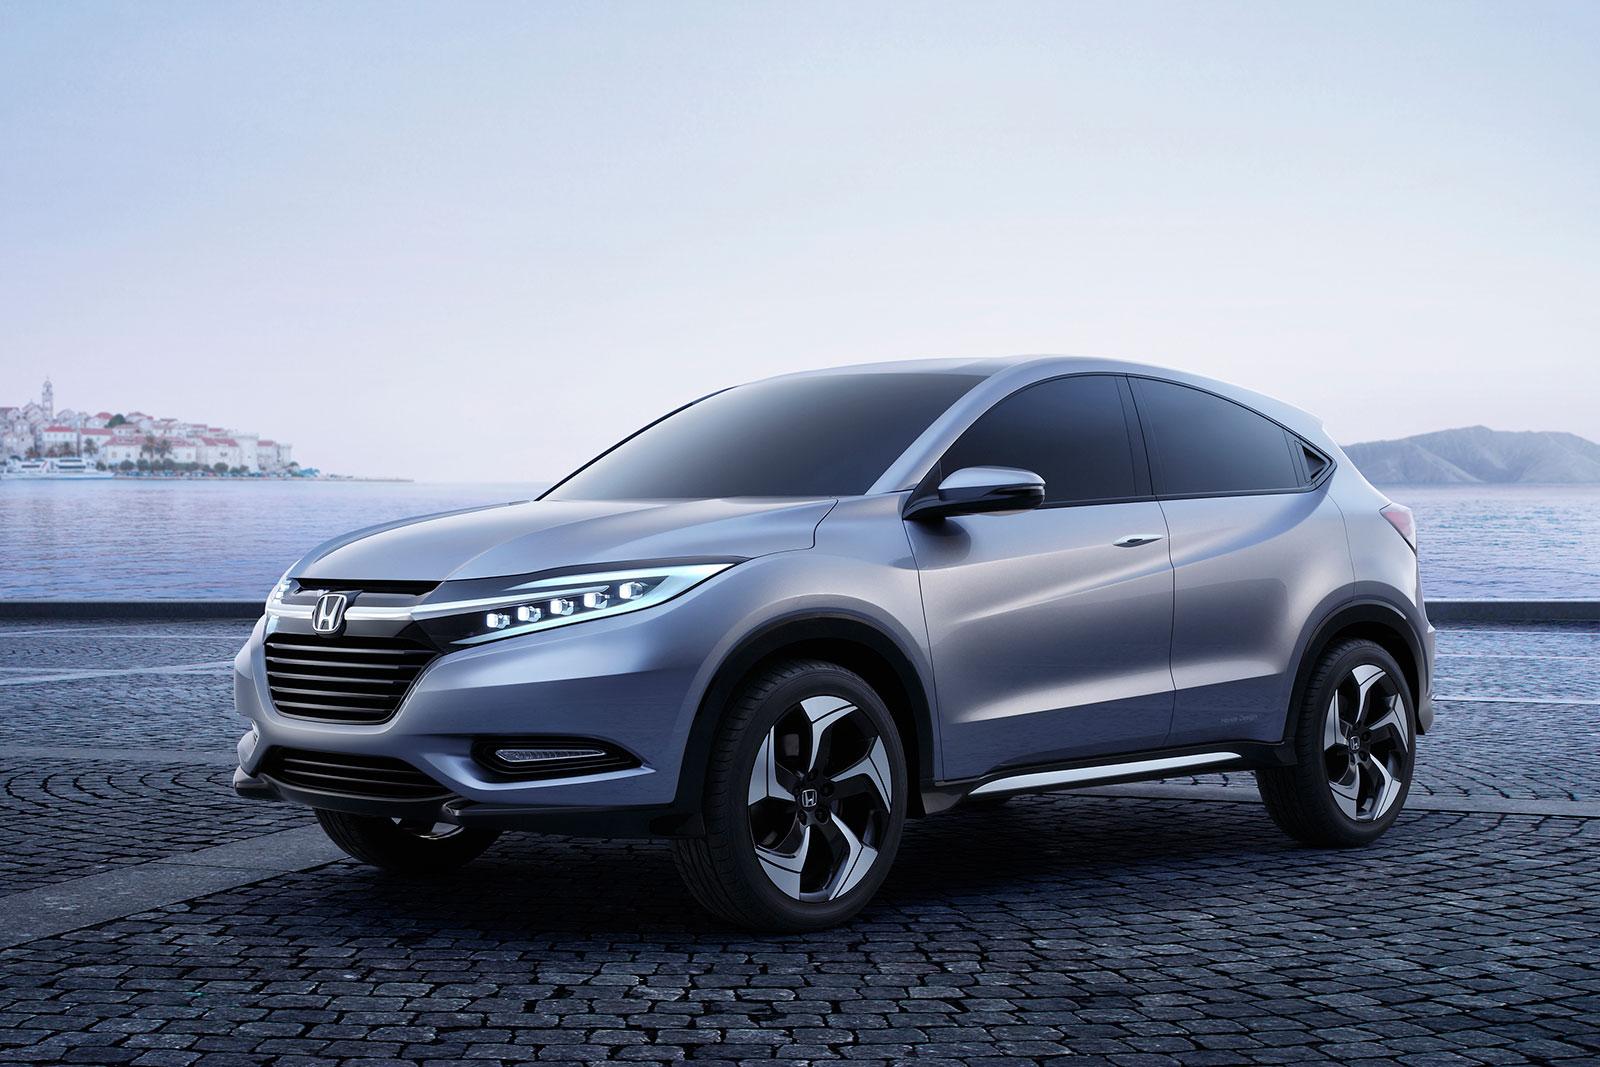 2013 Honda Urban SUV Concepts